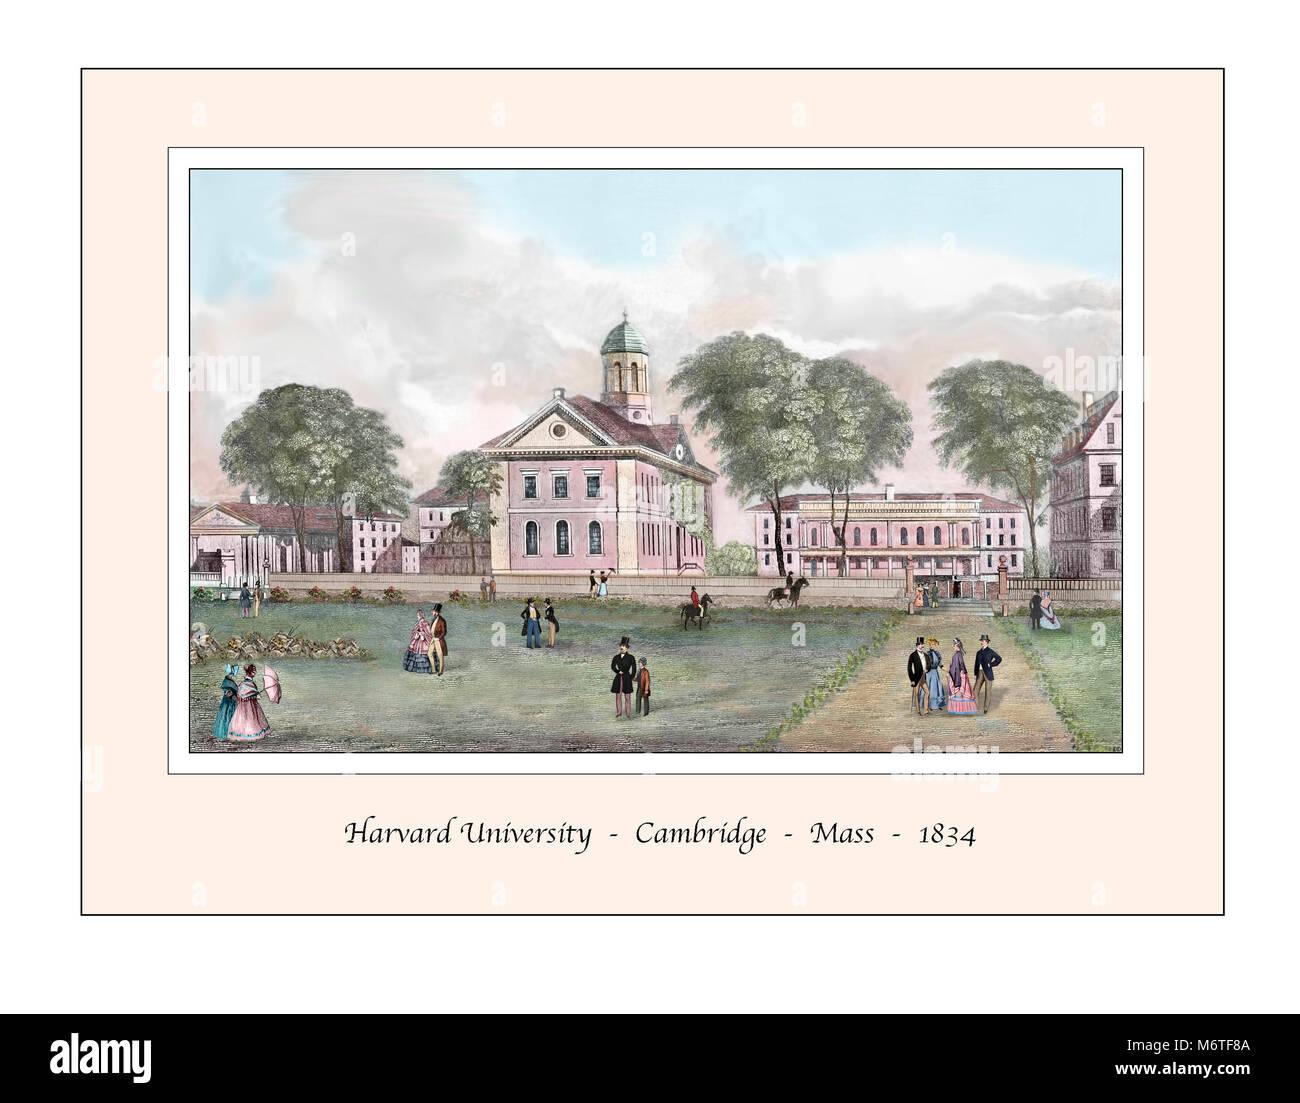 Harvard University Cambridge Massachusetts Original Design based on a 19th century Engraving - Stock Image